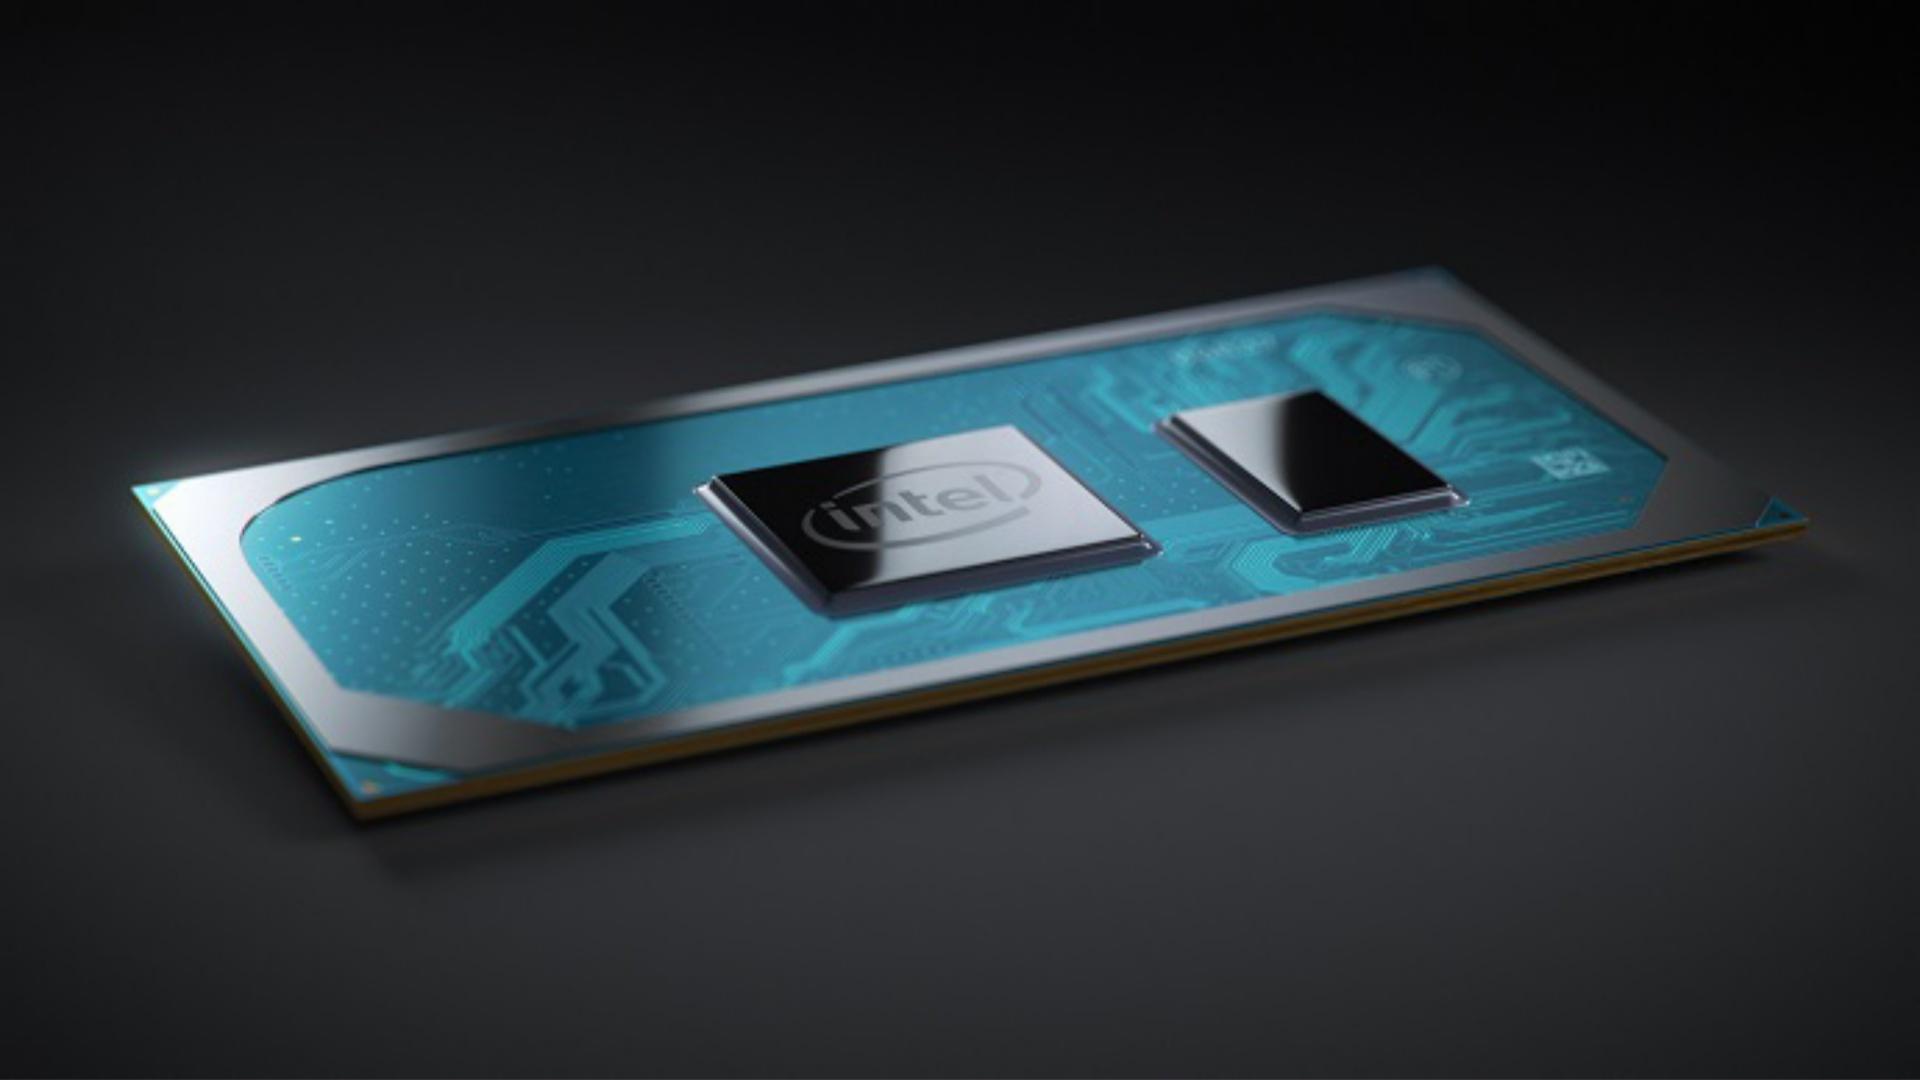 Intel представила мобильные процессоры Ice Lake на базе 10 нм